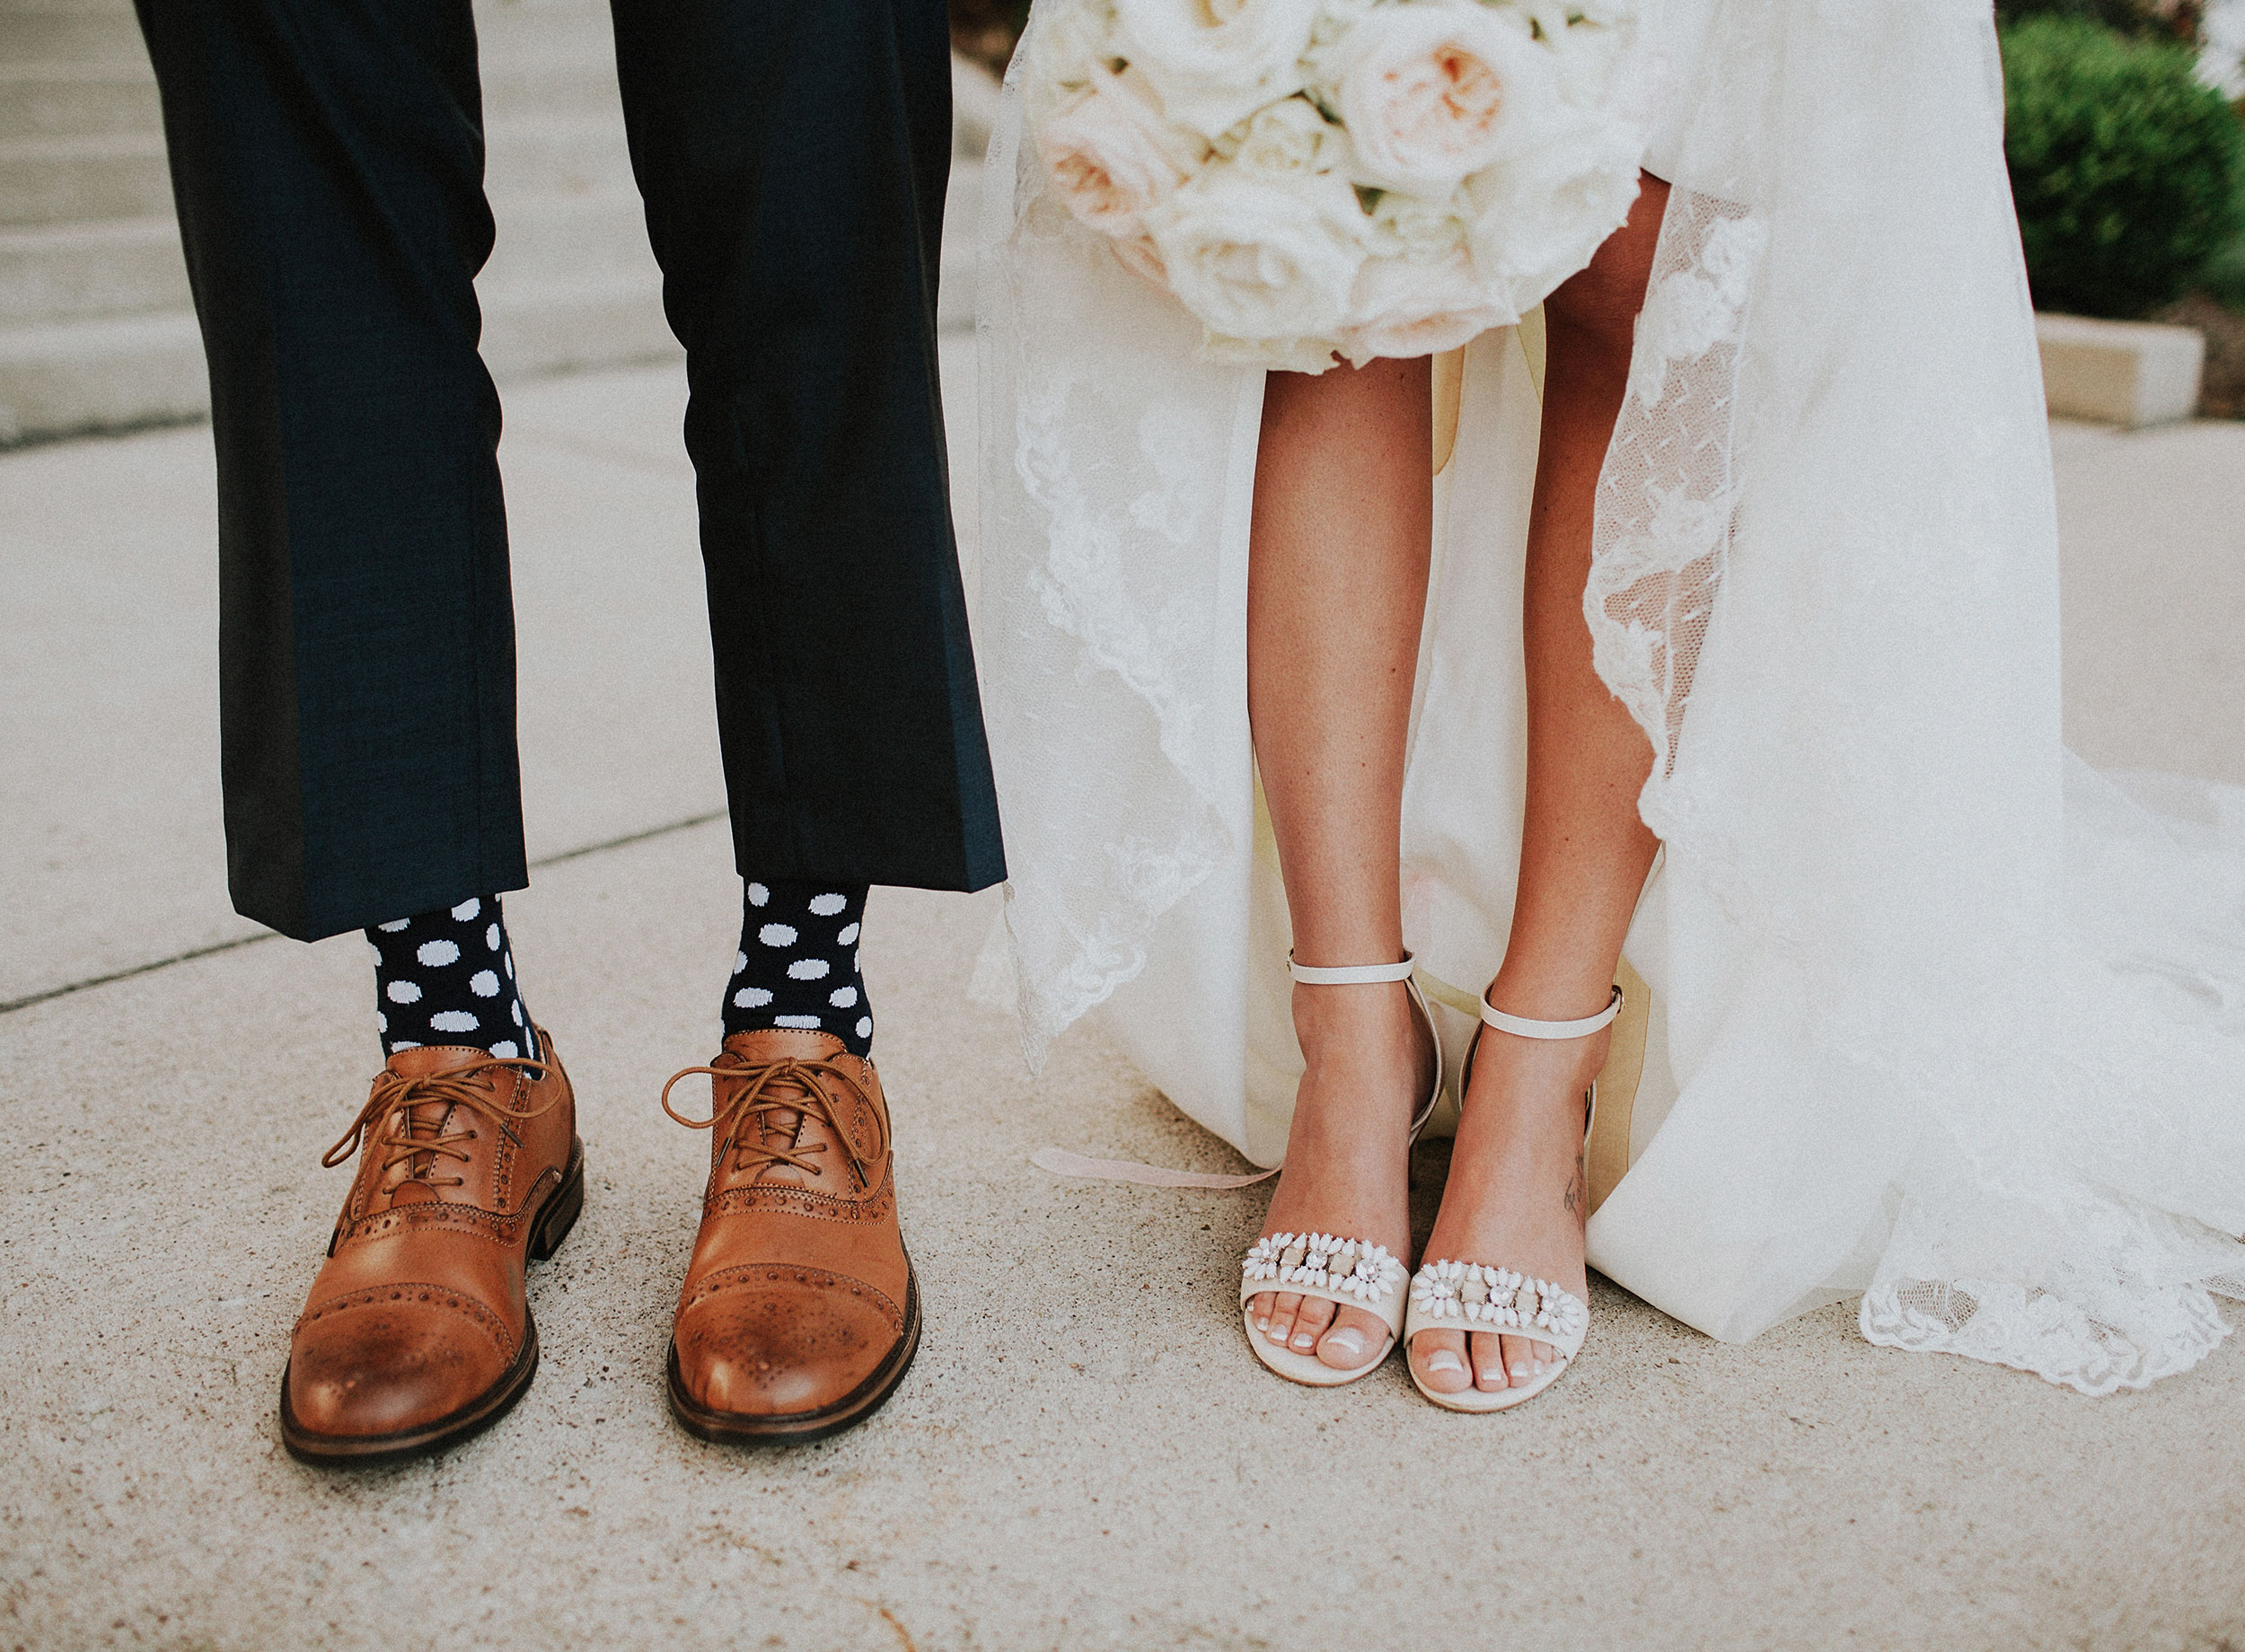 olmsted-wedding-louisville-kentucky-036.JPG